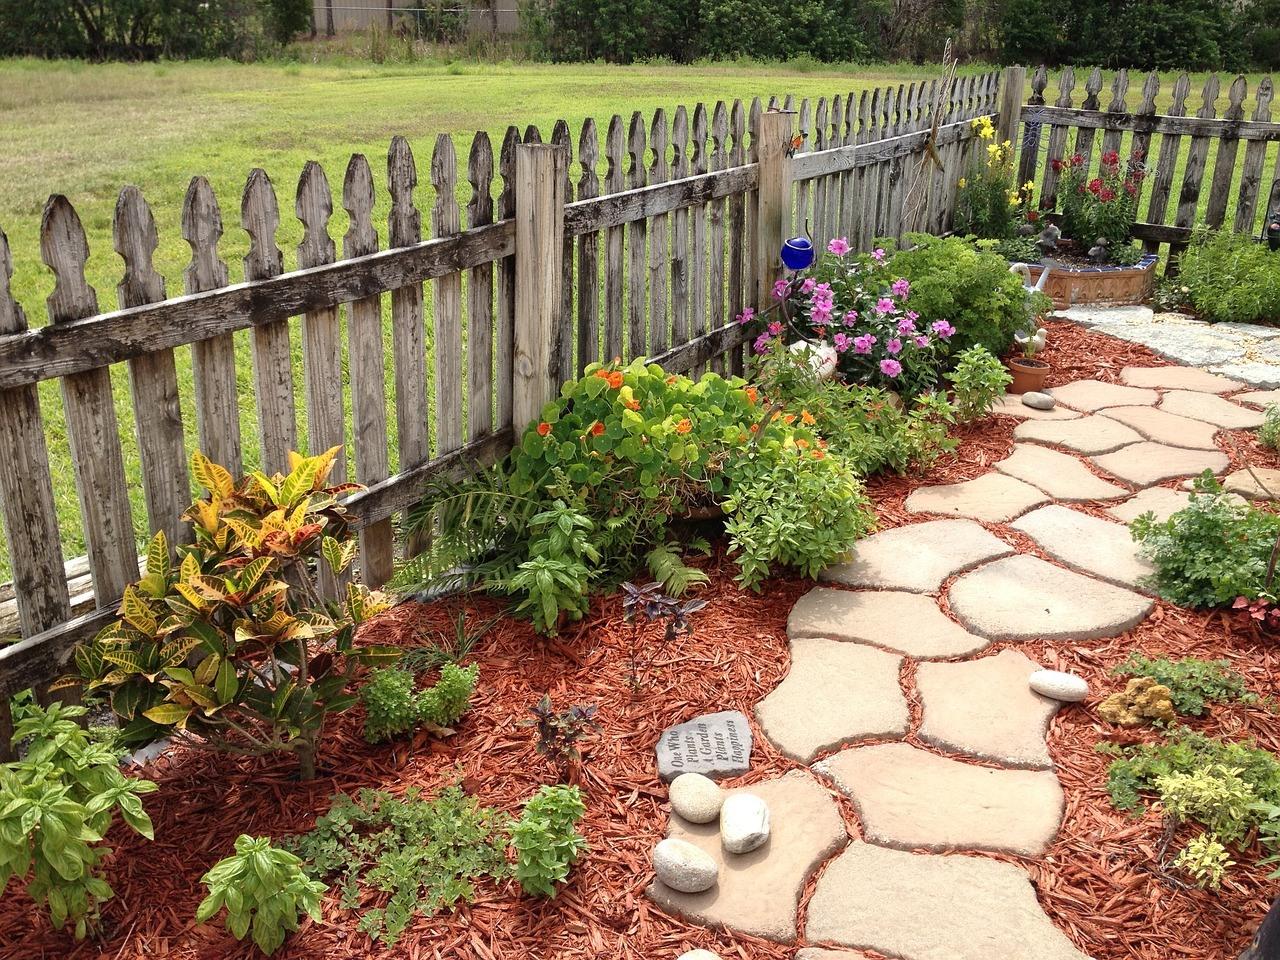 12 amazing garden path ideas to consider - a green hand